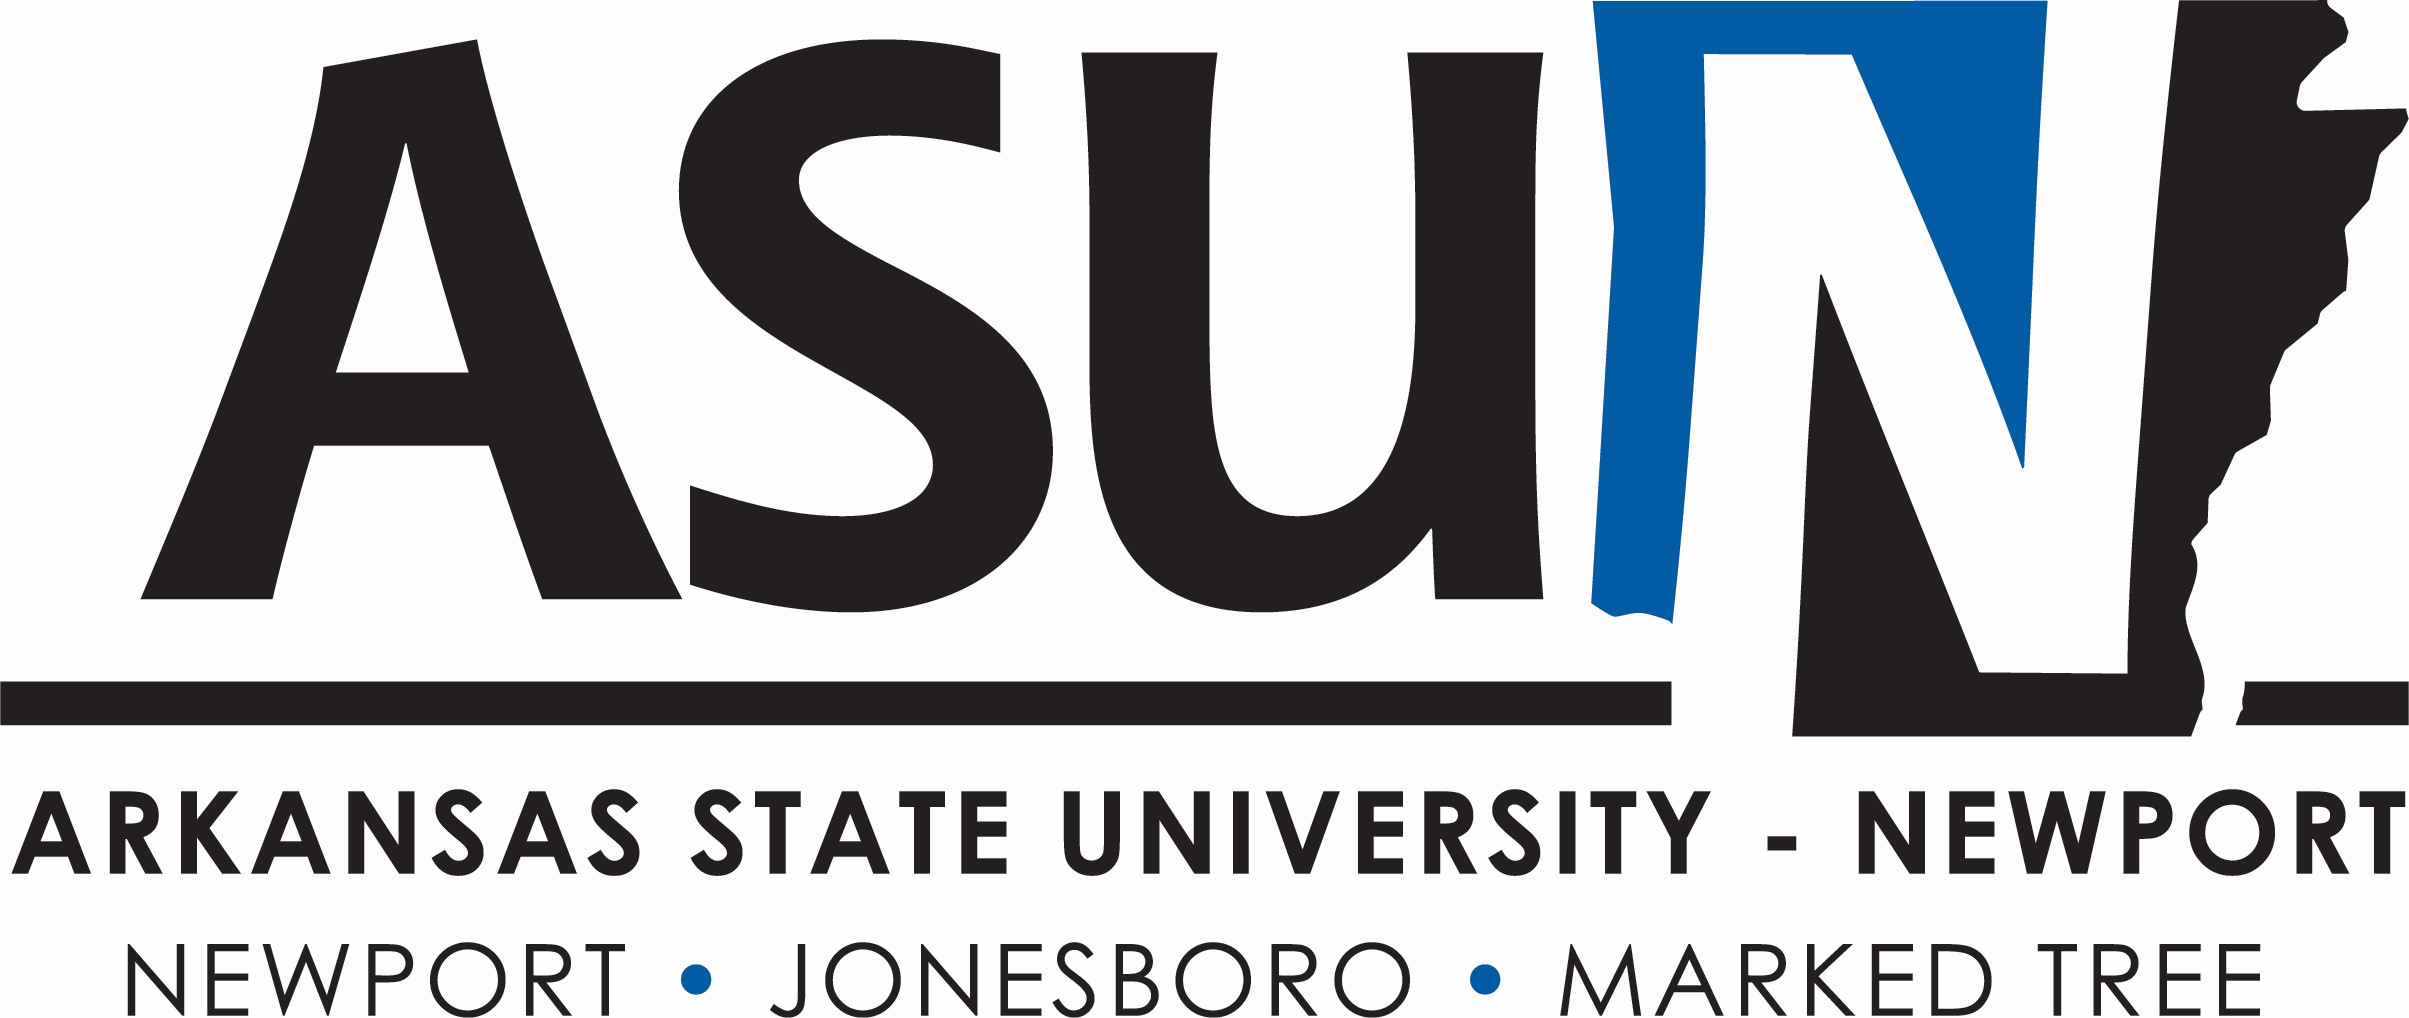 Arkansas State University-Newport